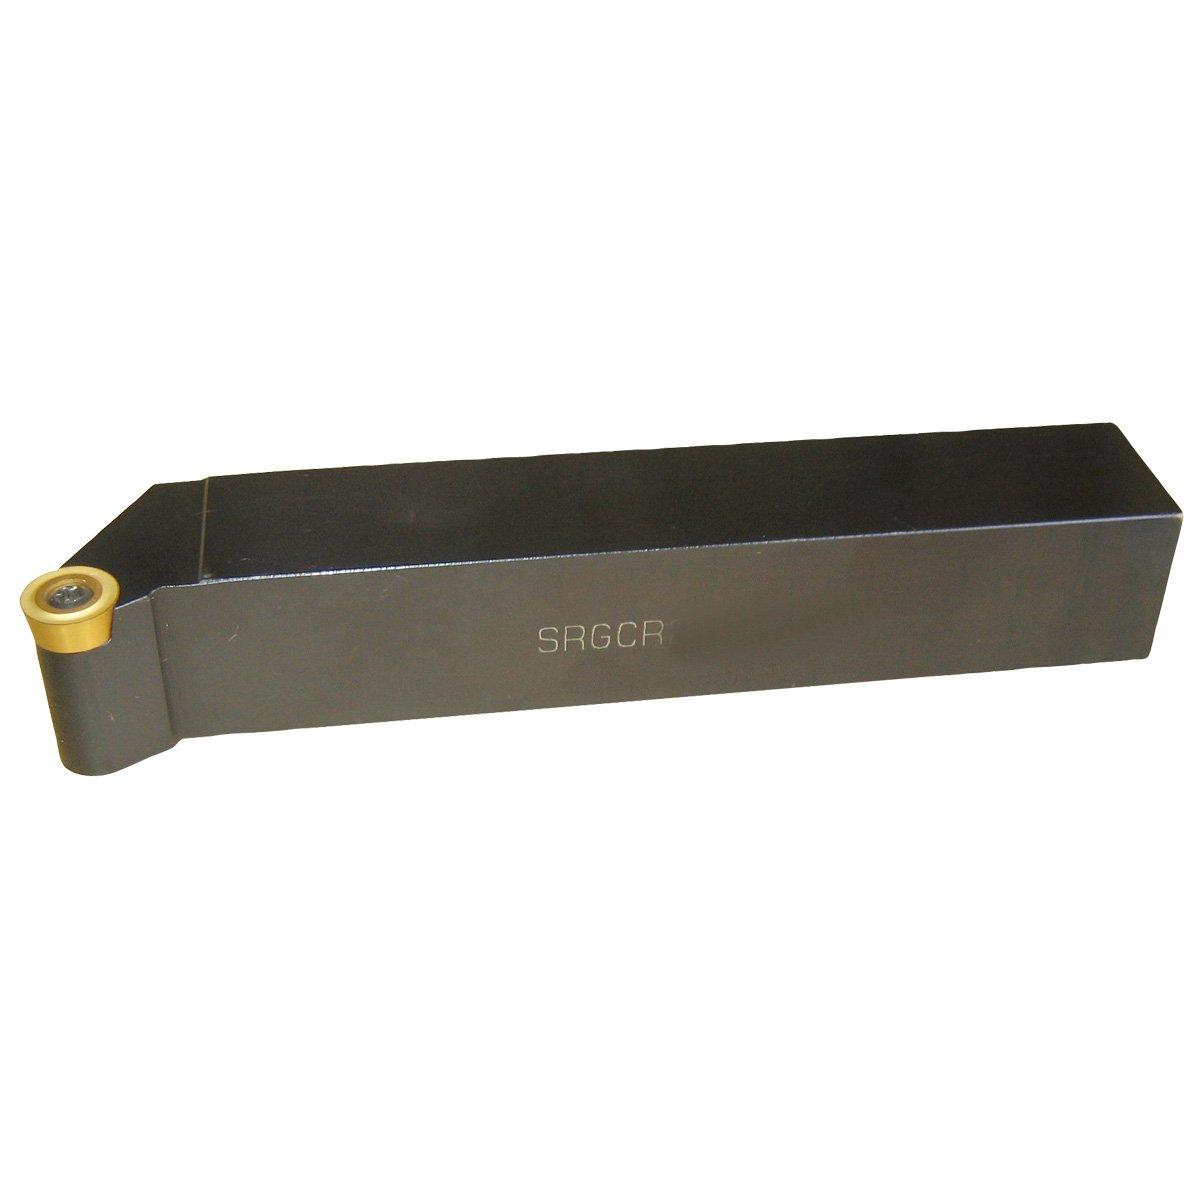 HHIP 2038-0122 Style SRGCR 12-3B Turning Tool Holder